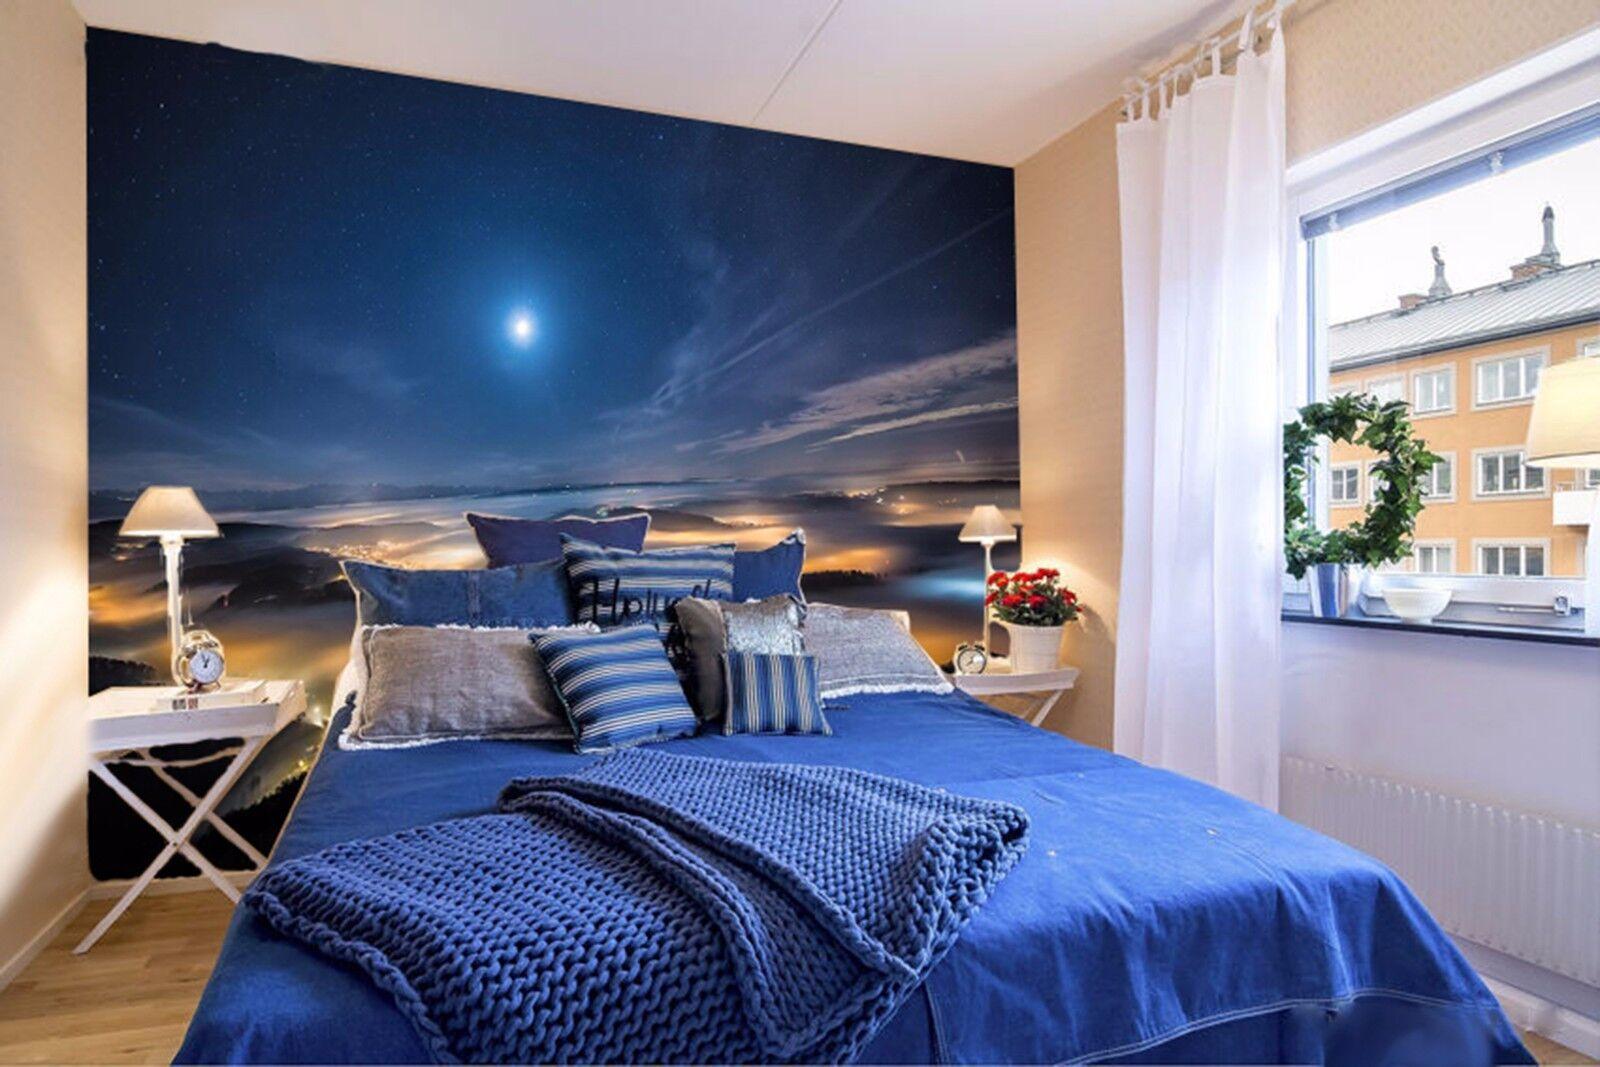 3D Himmel das Licht 835 Wandbild Fototapete Bild Tapete Familie Kinder DE Lemon